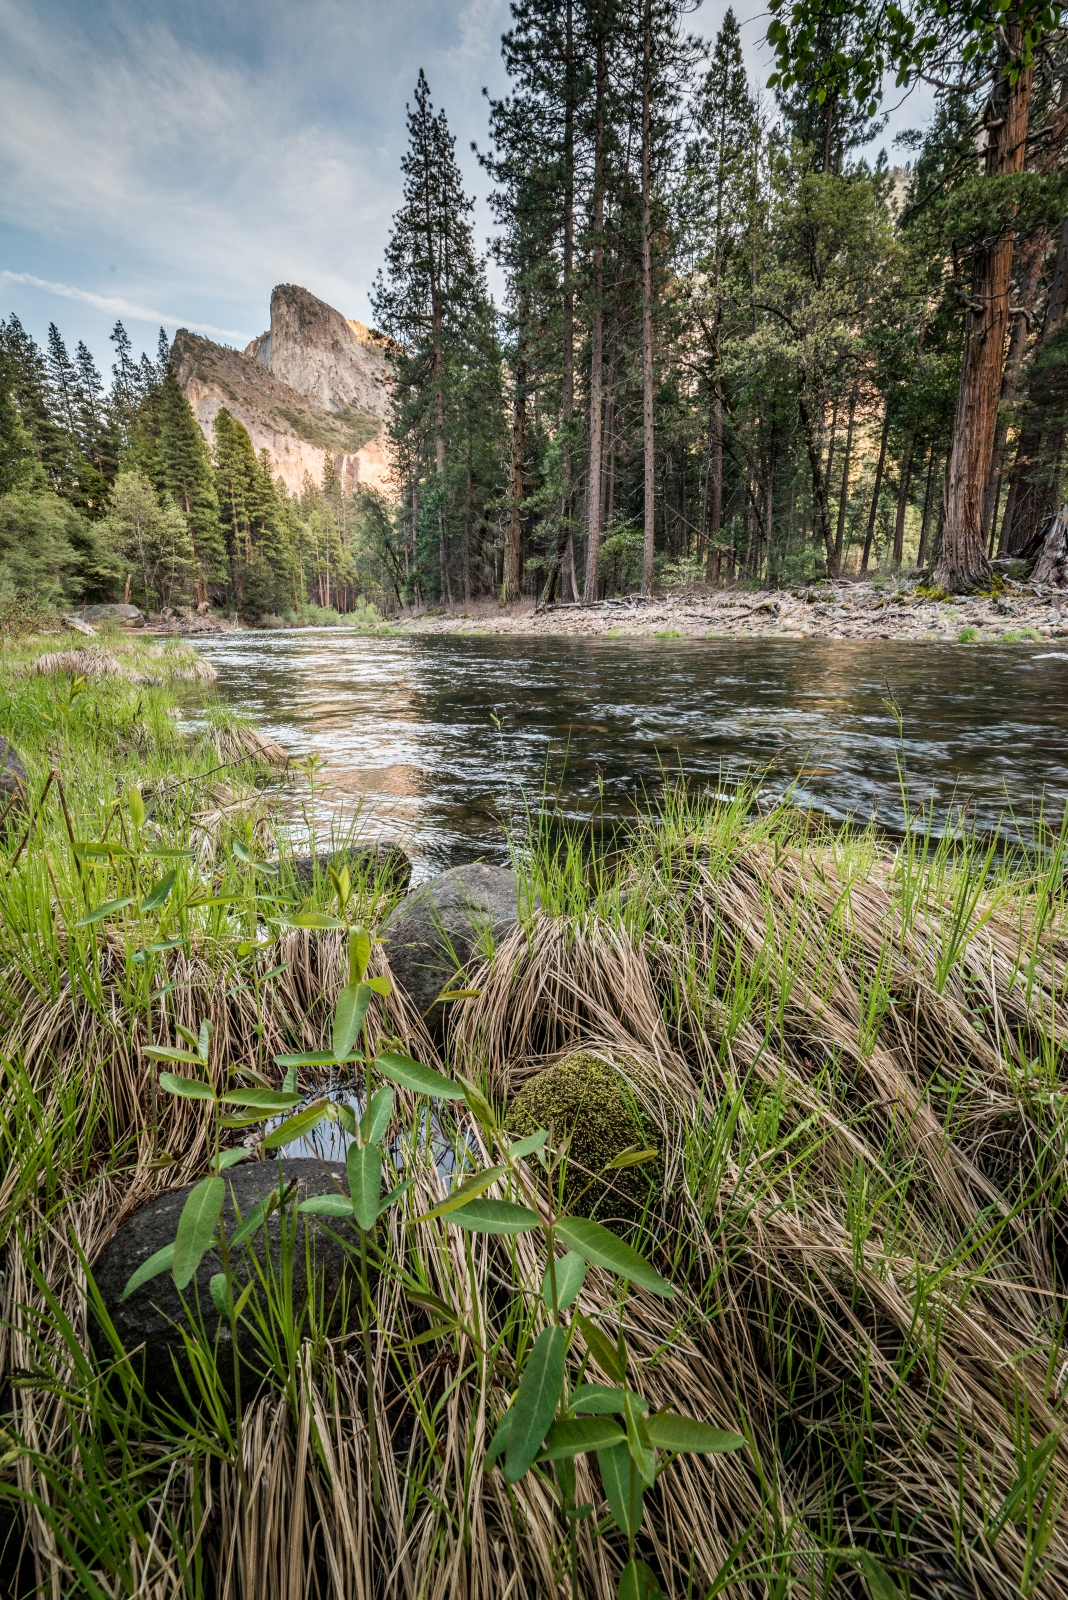 DSC6011 - Merced River Yosemite